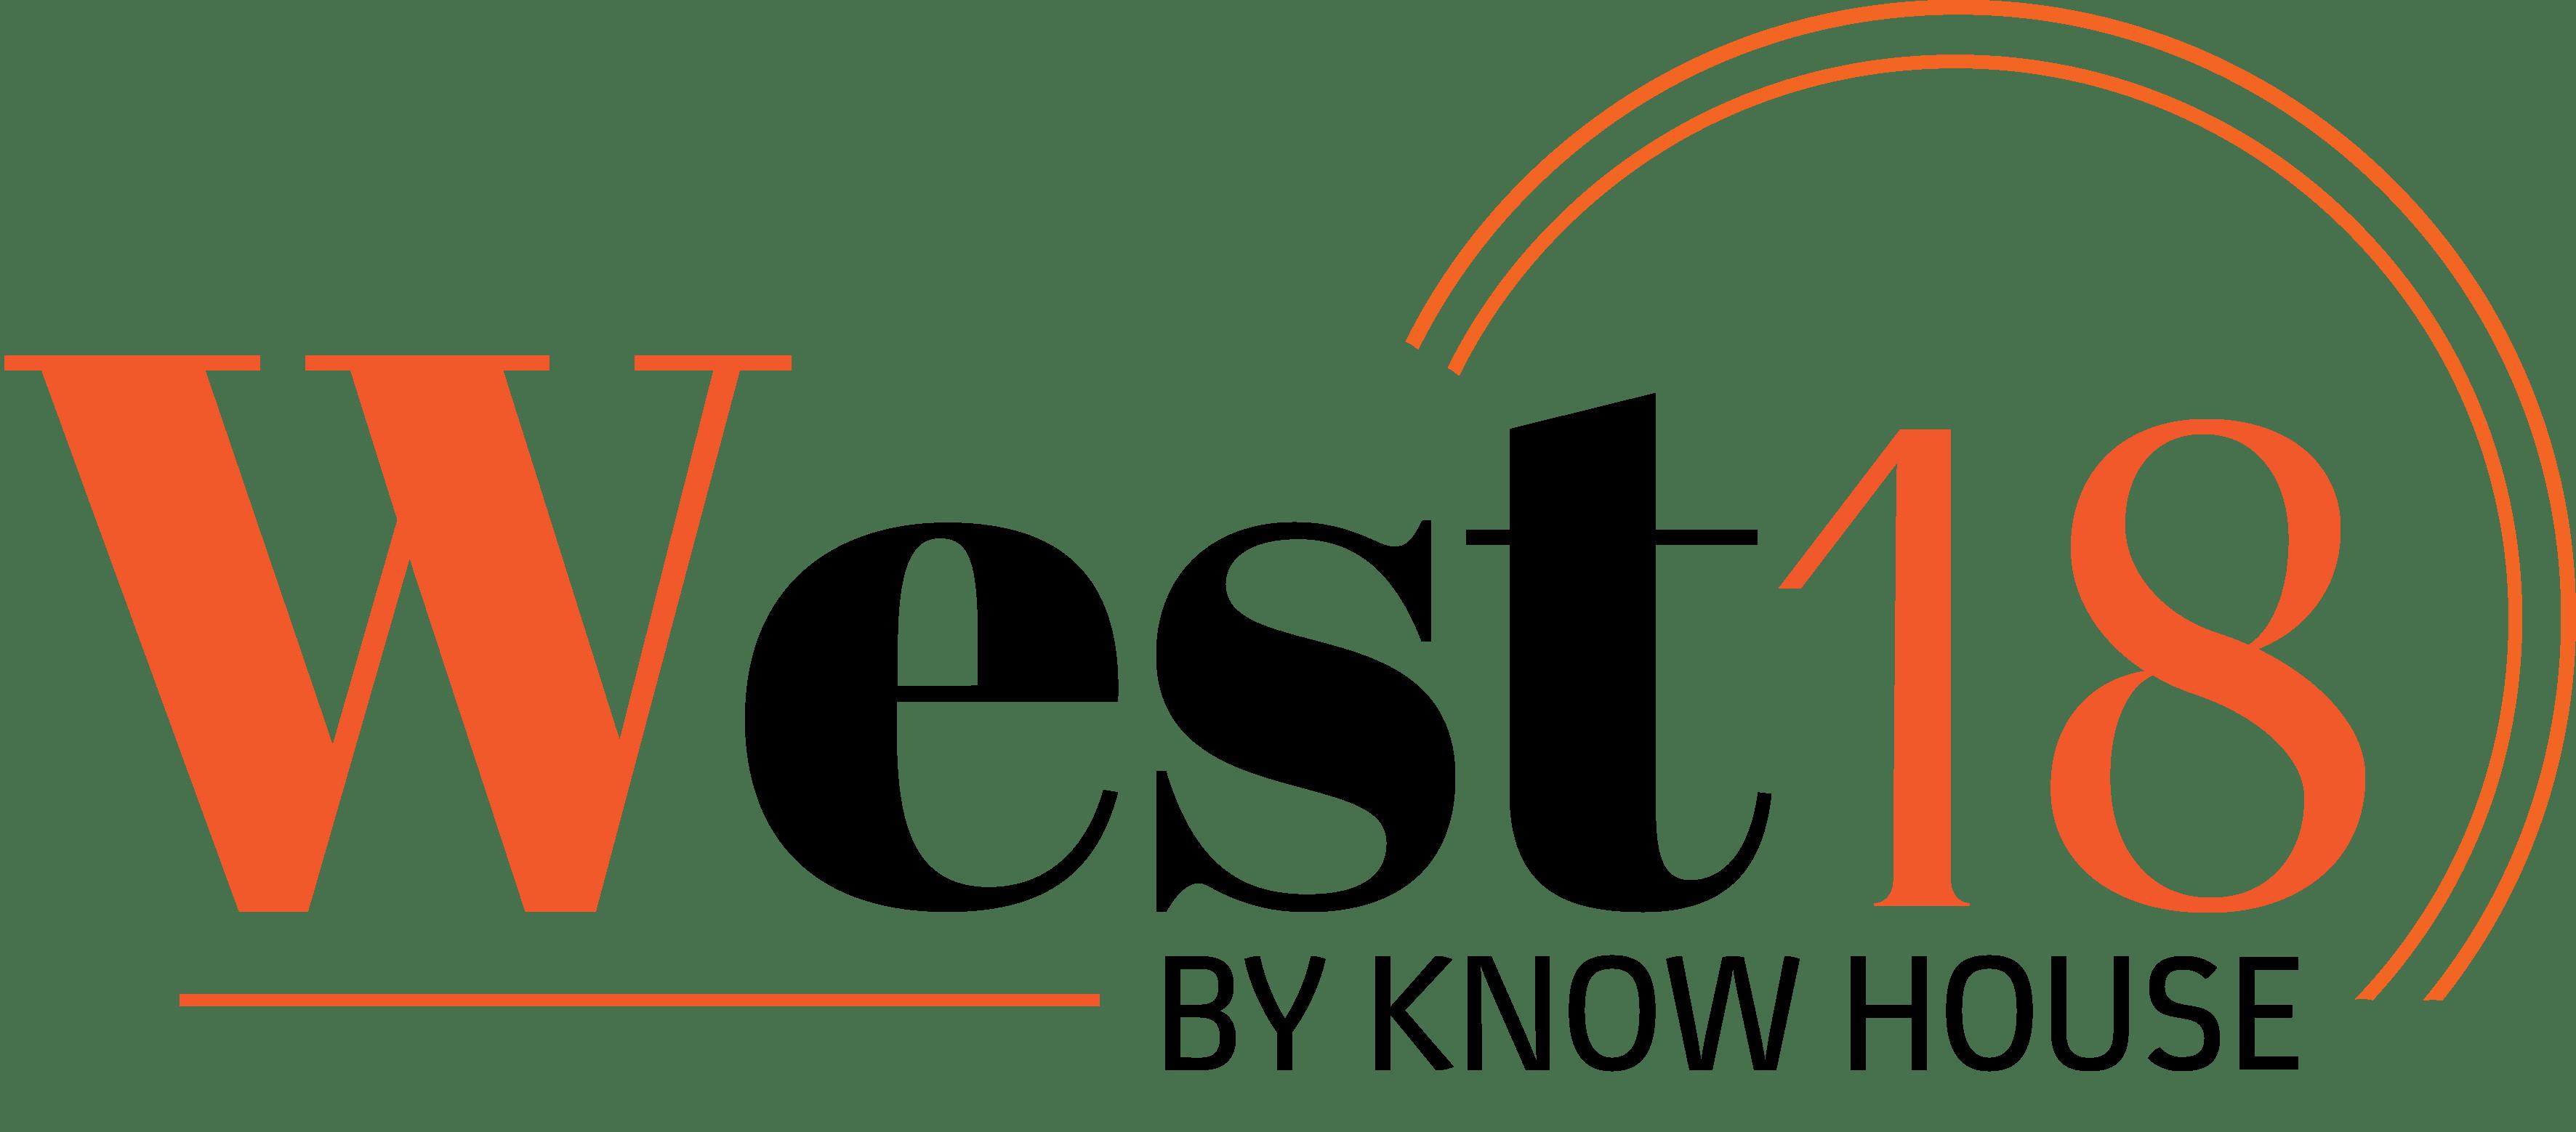 West 18 logo